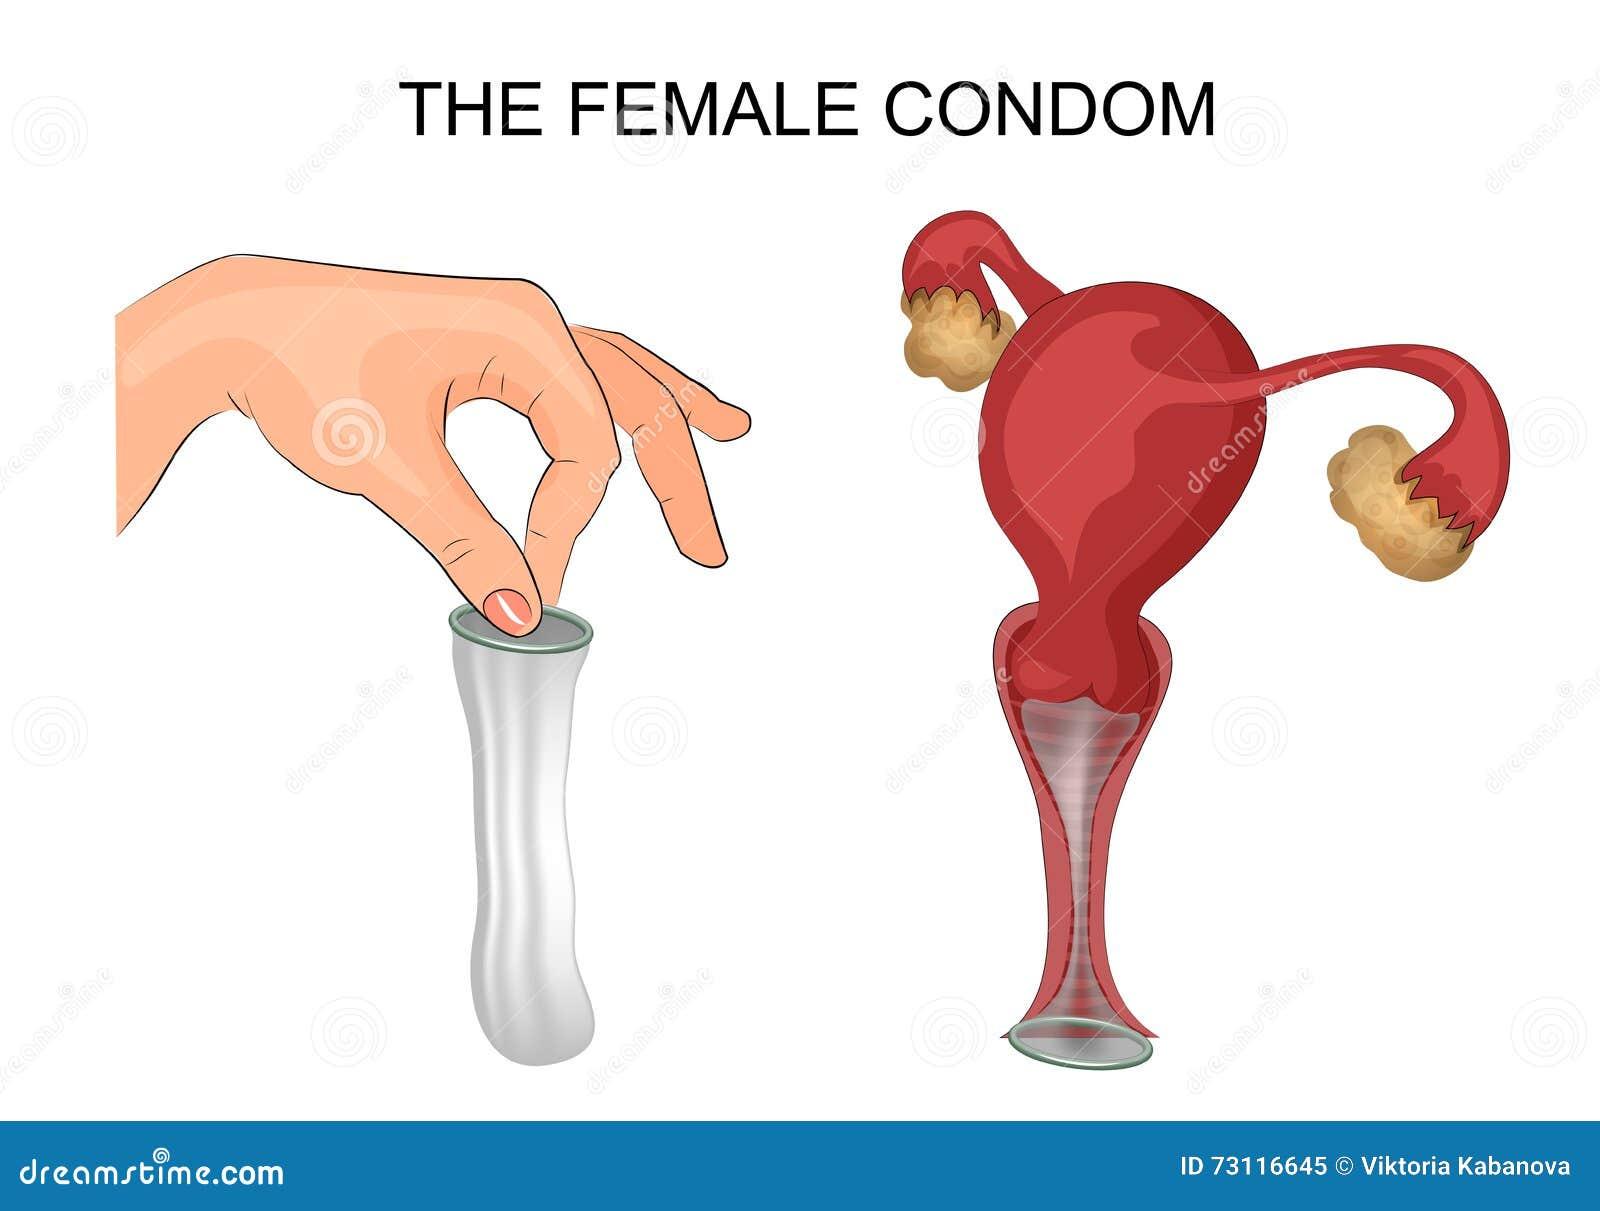 Женский презерватив во влагалище фото фото 366-481